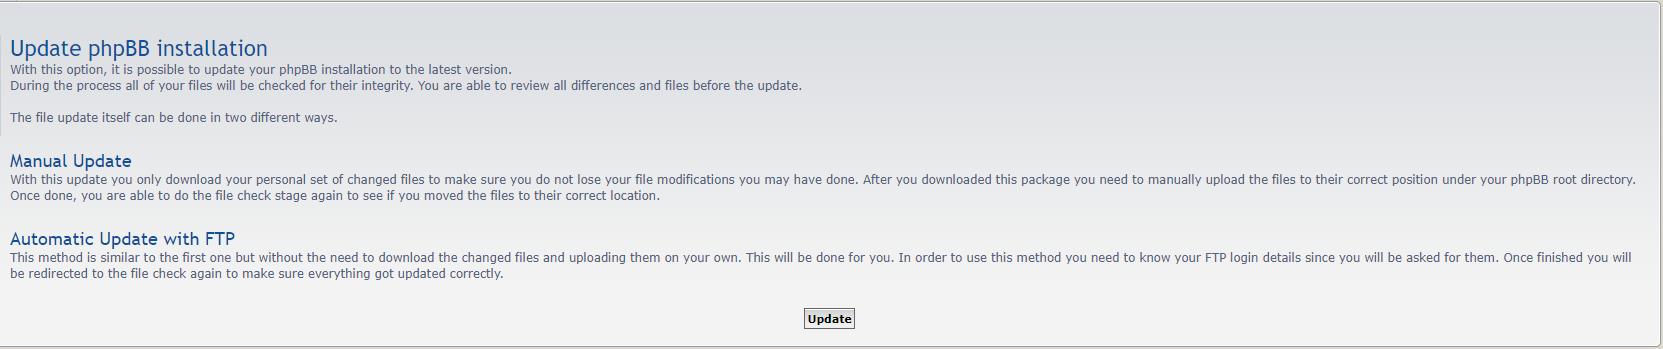 upgrading phpbb